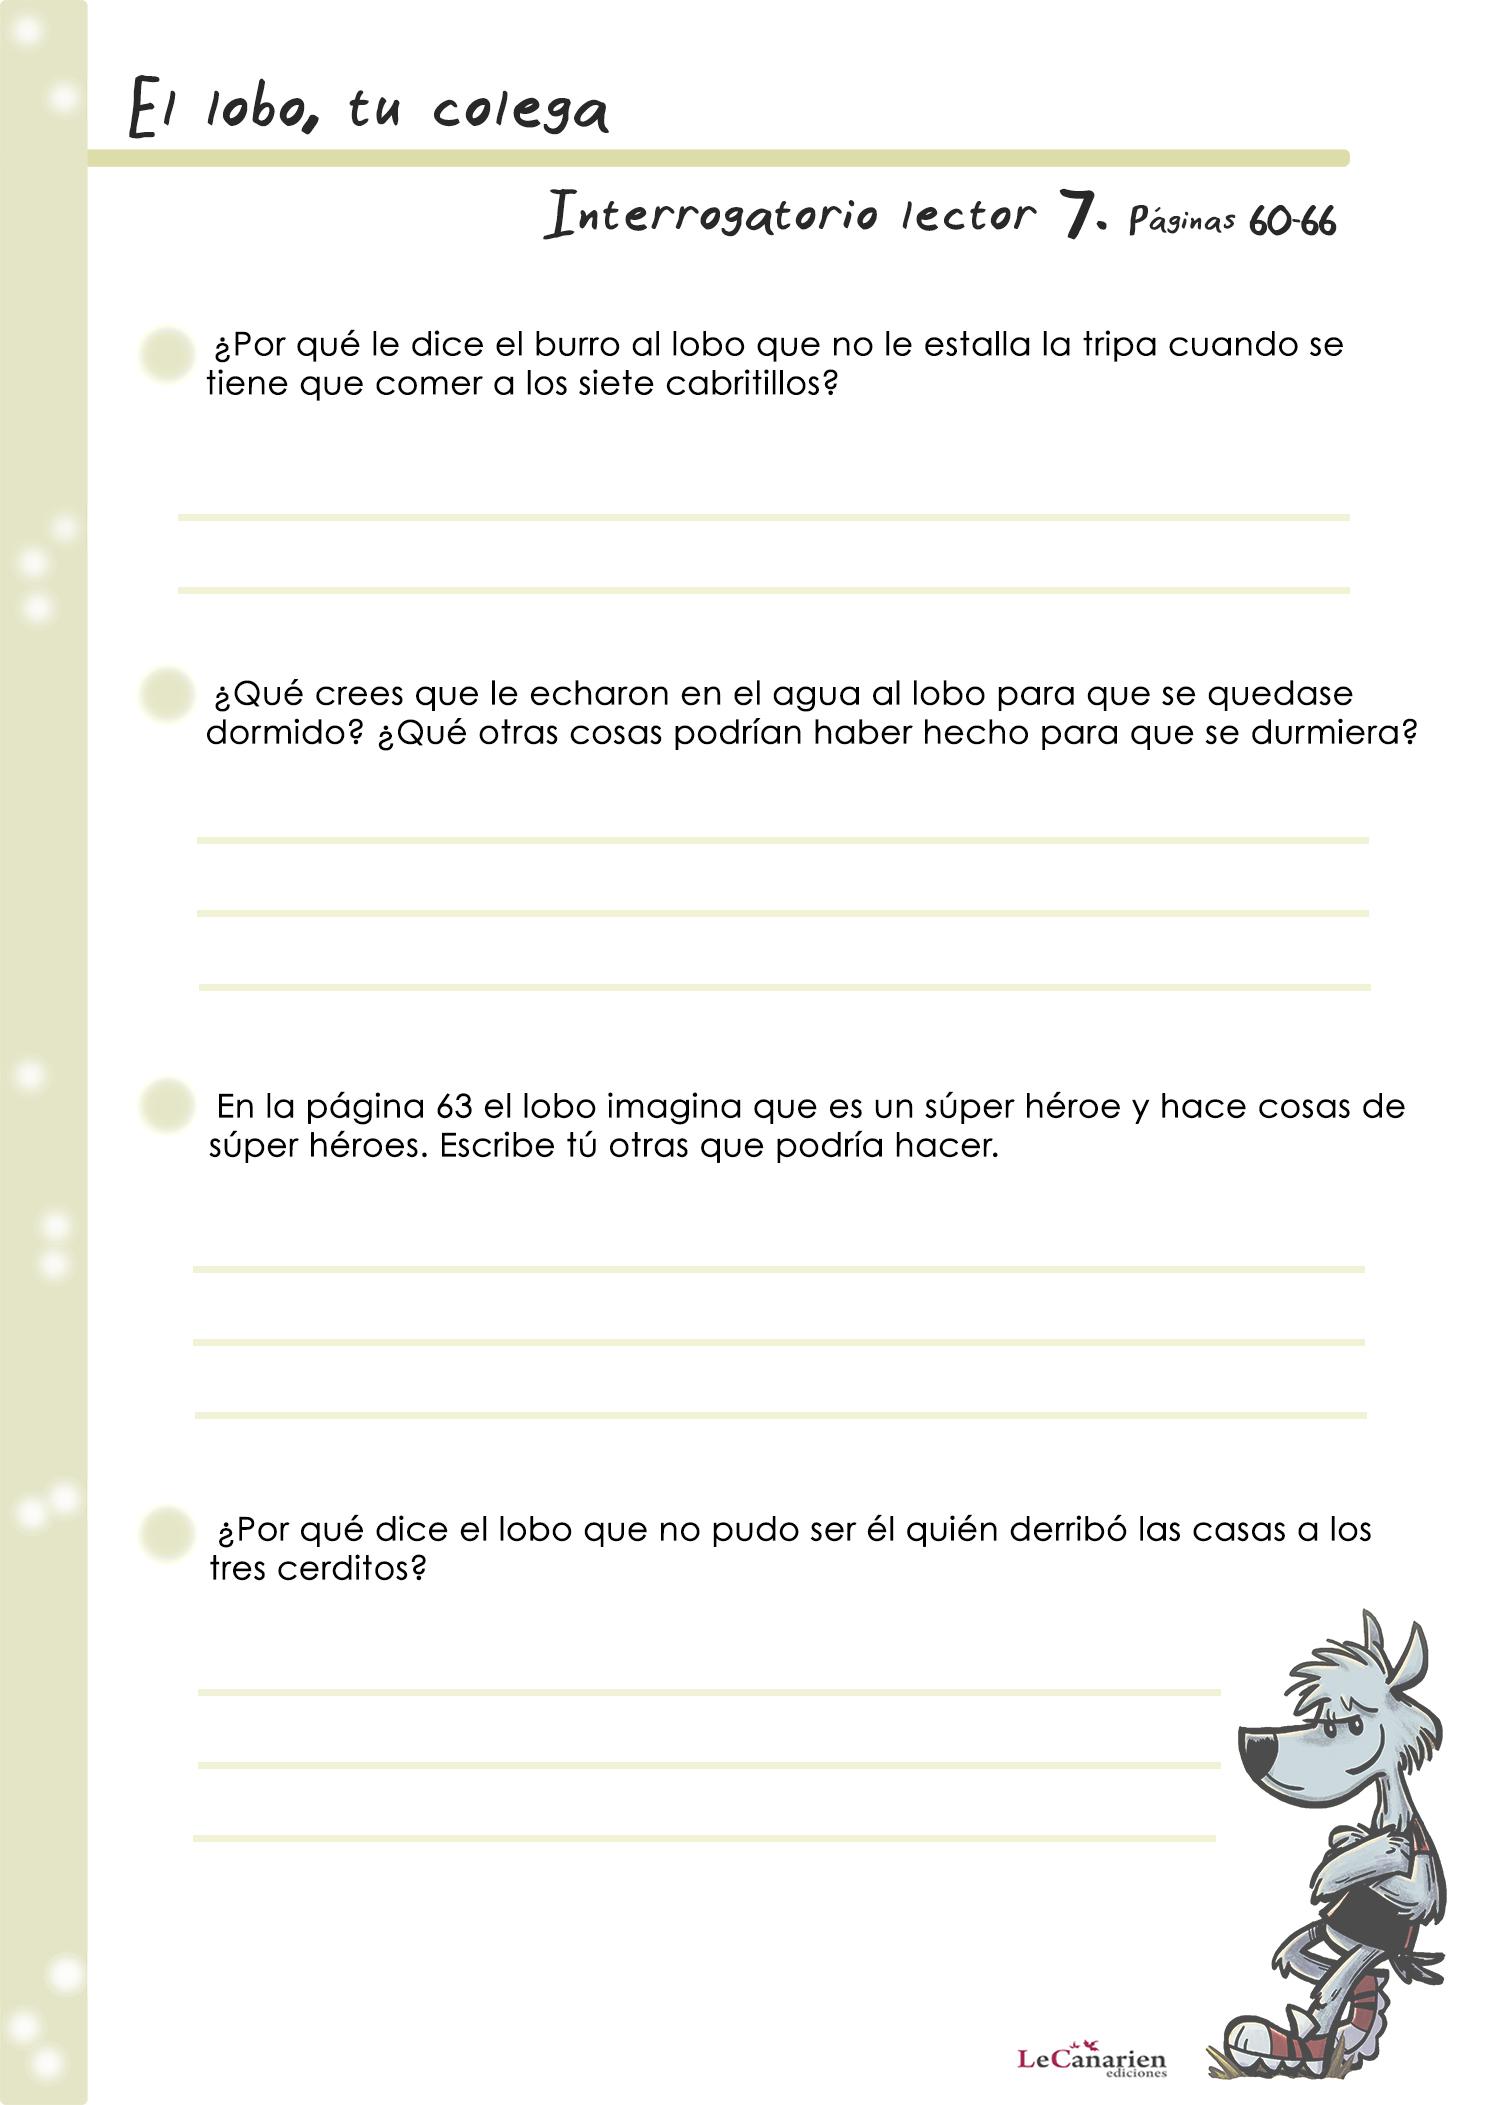 INTERROGATORIO LECTOR 7